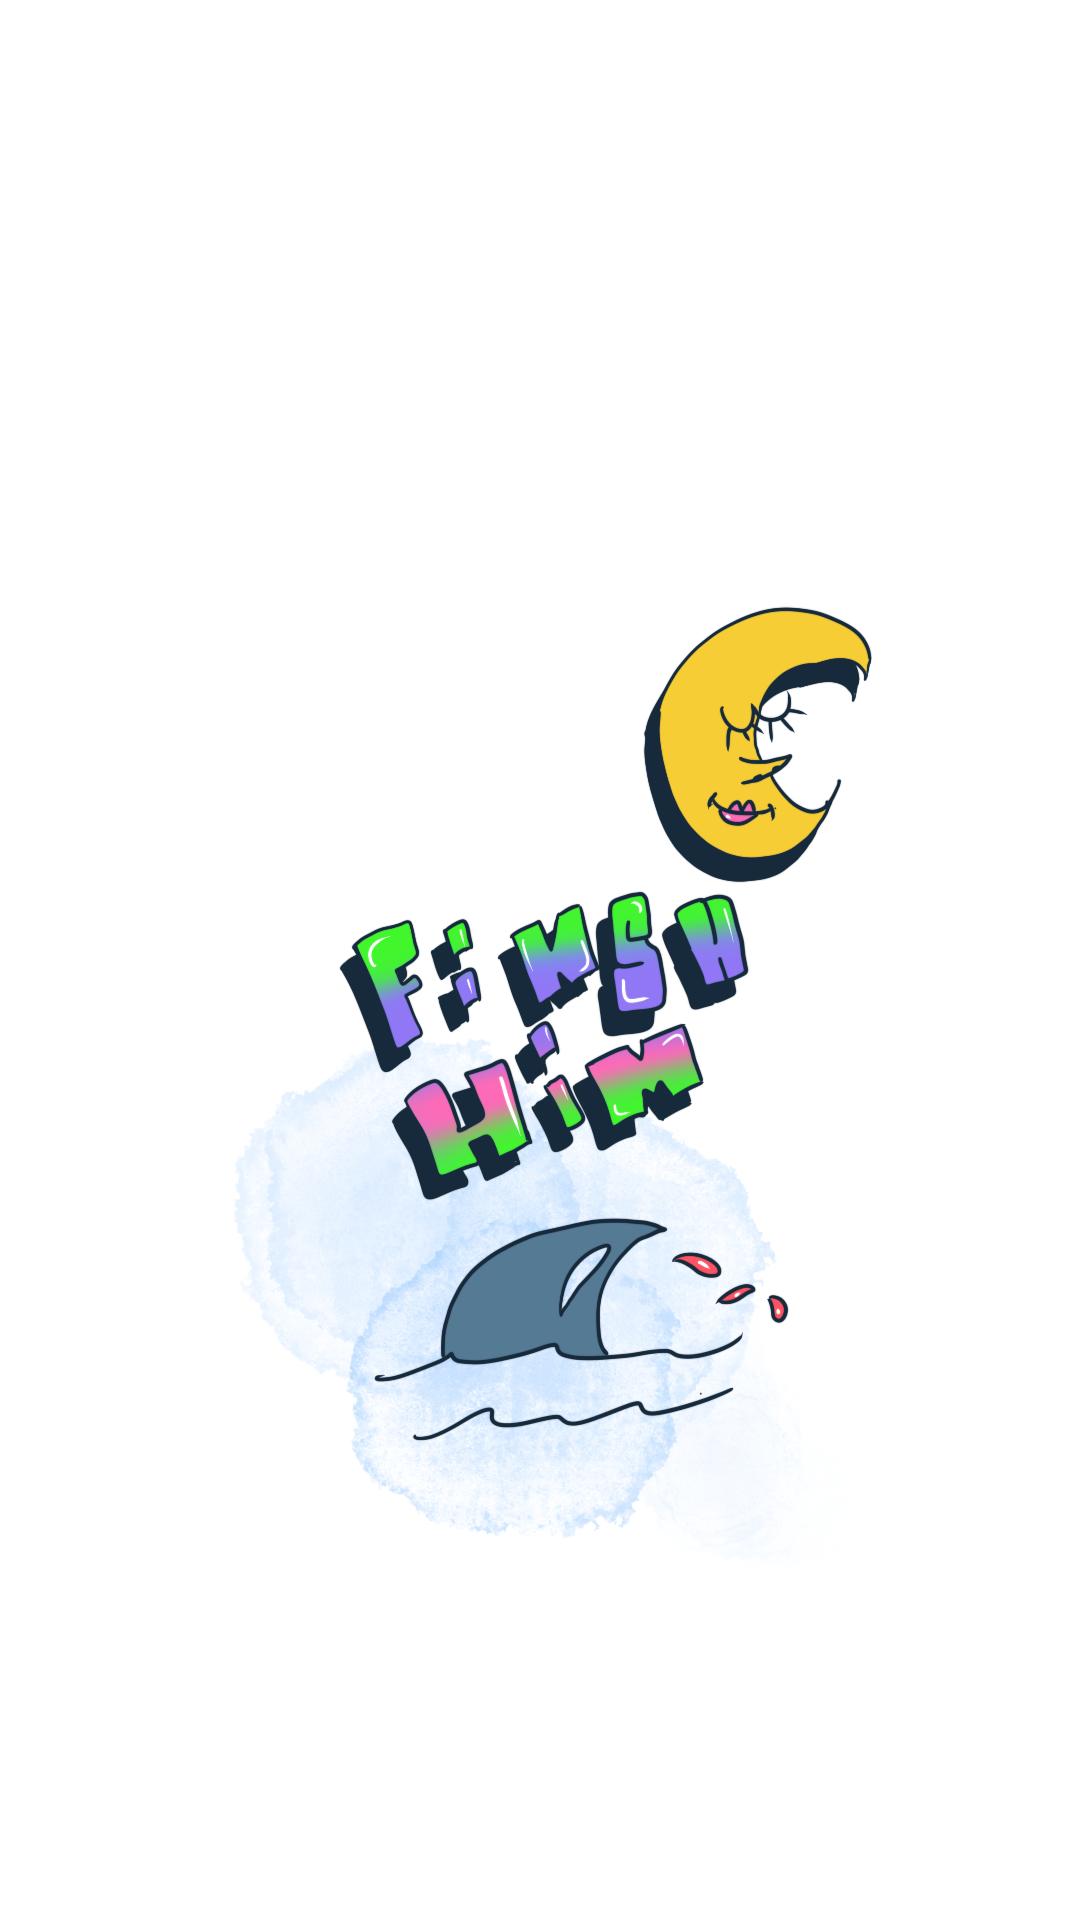 Finish Him Shark Fin Phone Wallpaper Android Wallpaper Wallpaper Ios Wallpapers